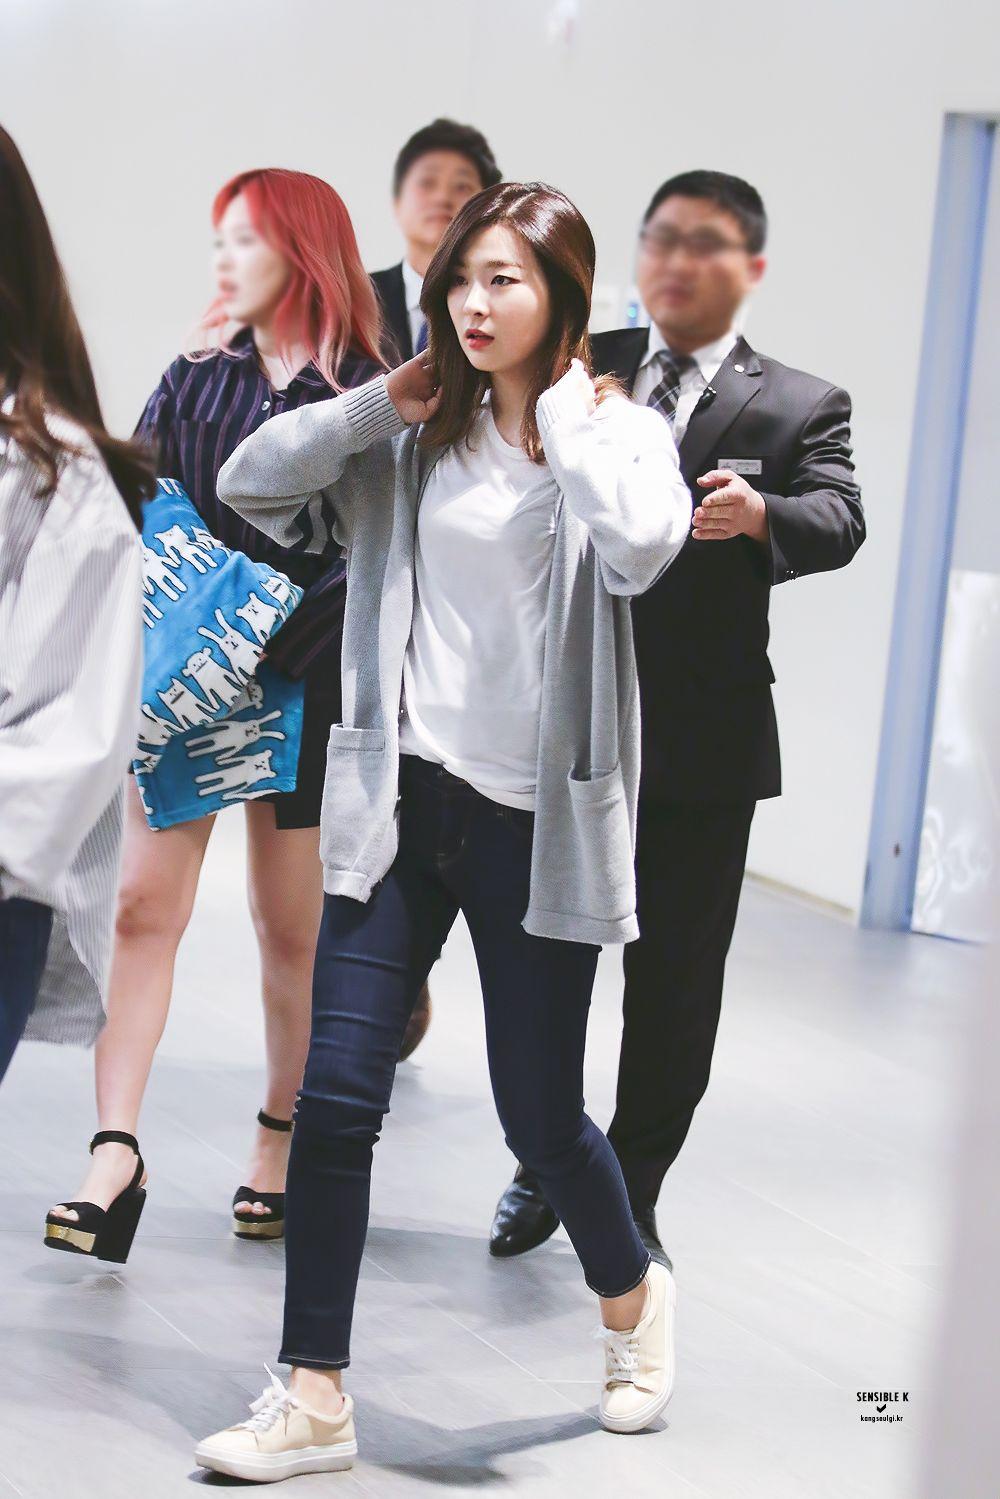 Seulgi Fashion Seulgi Airport Fashion Seulgi Airport 2016 Red Velvet Seulgi 2016 Seulgi Outfits Gaya Model Pakaian Korea Gaya Model Pakaian Pakaian Trendi